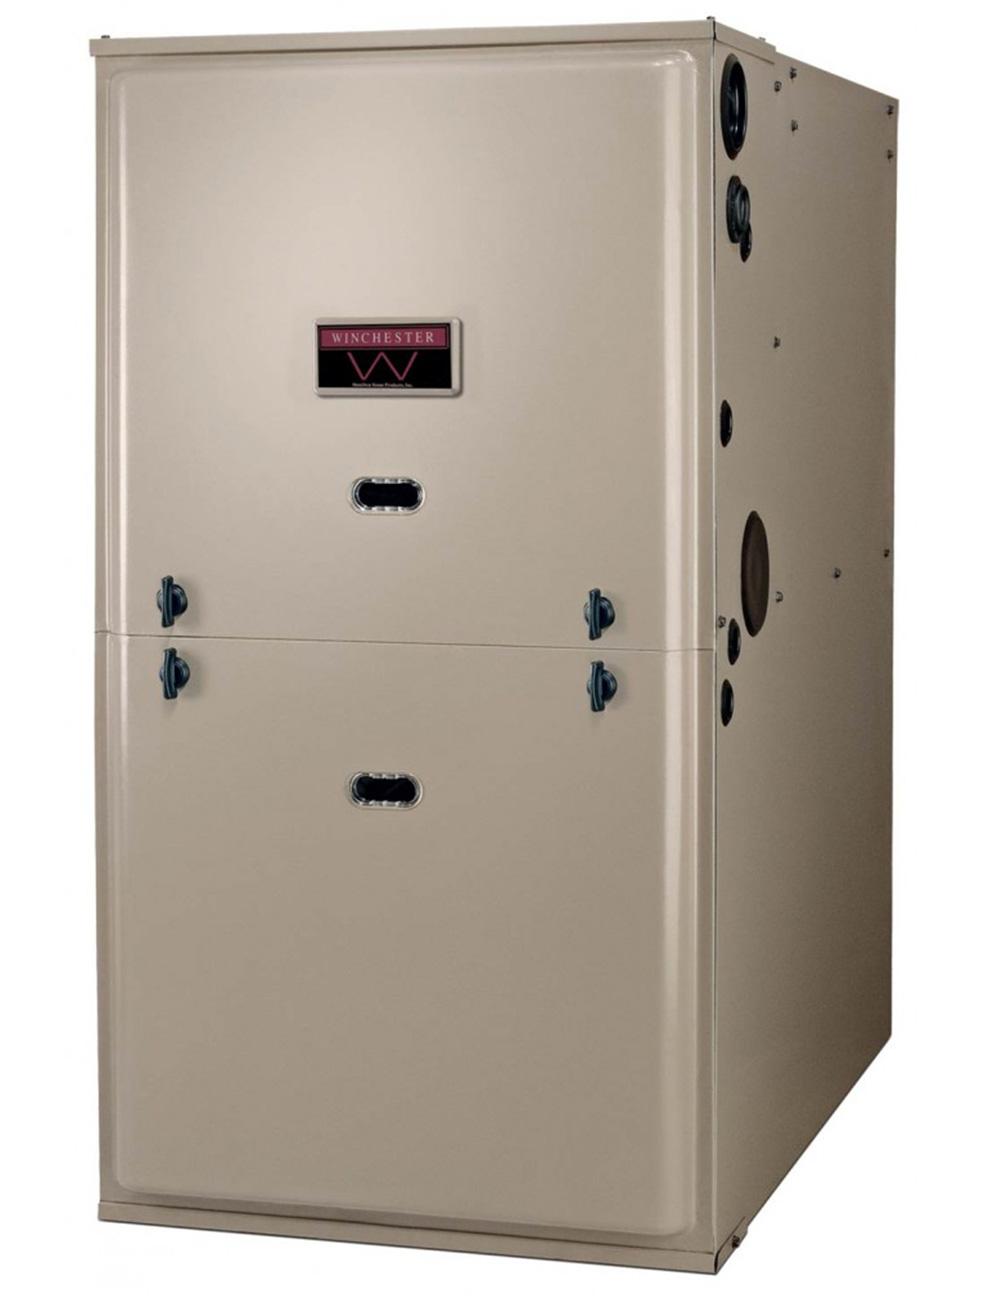 Kelvinator 80 Efficiency Single Stage Upflow Horizontal Gas 850 Furnace Schematic Read More